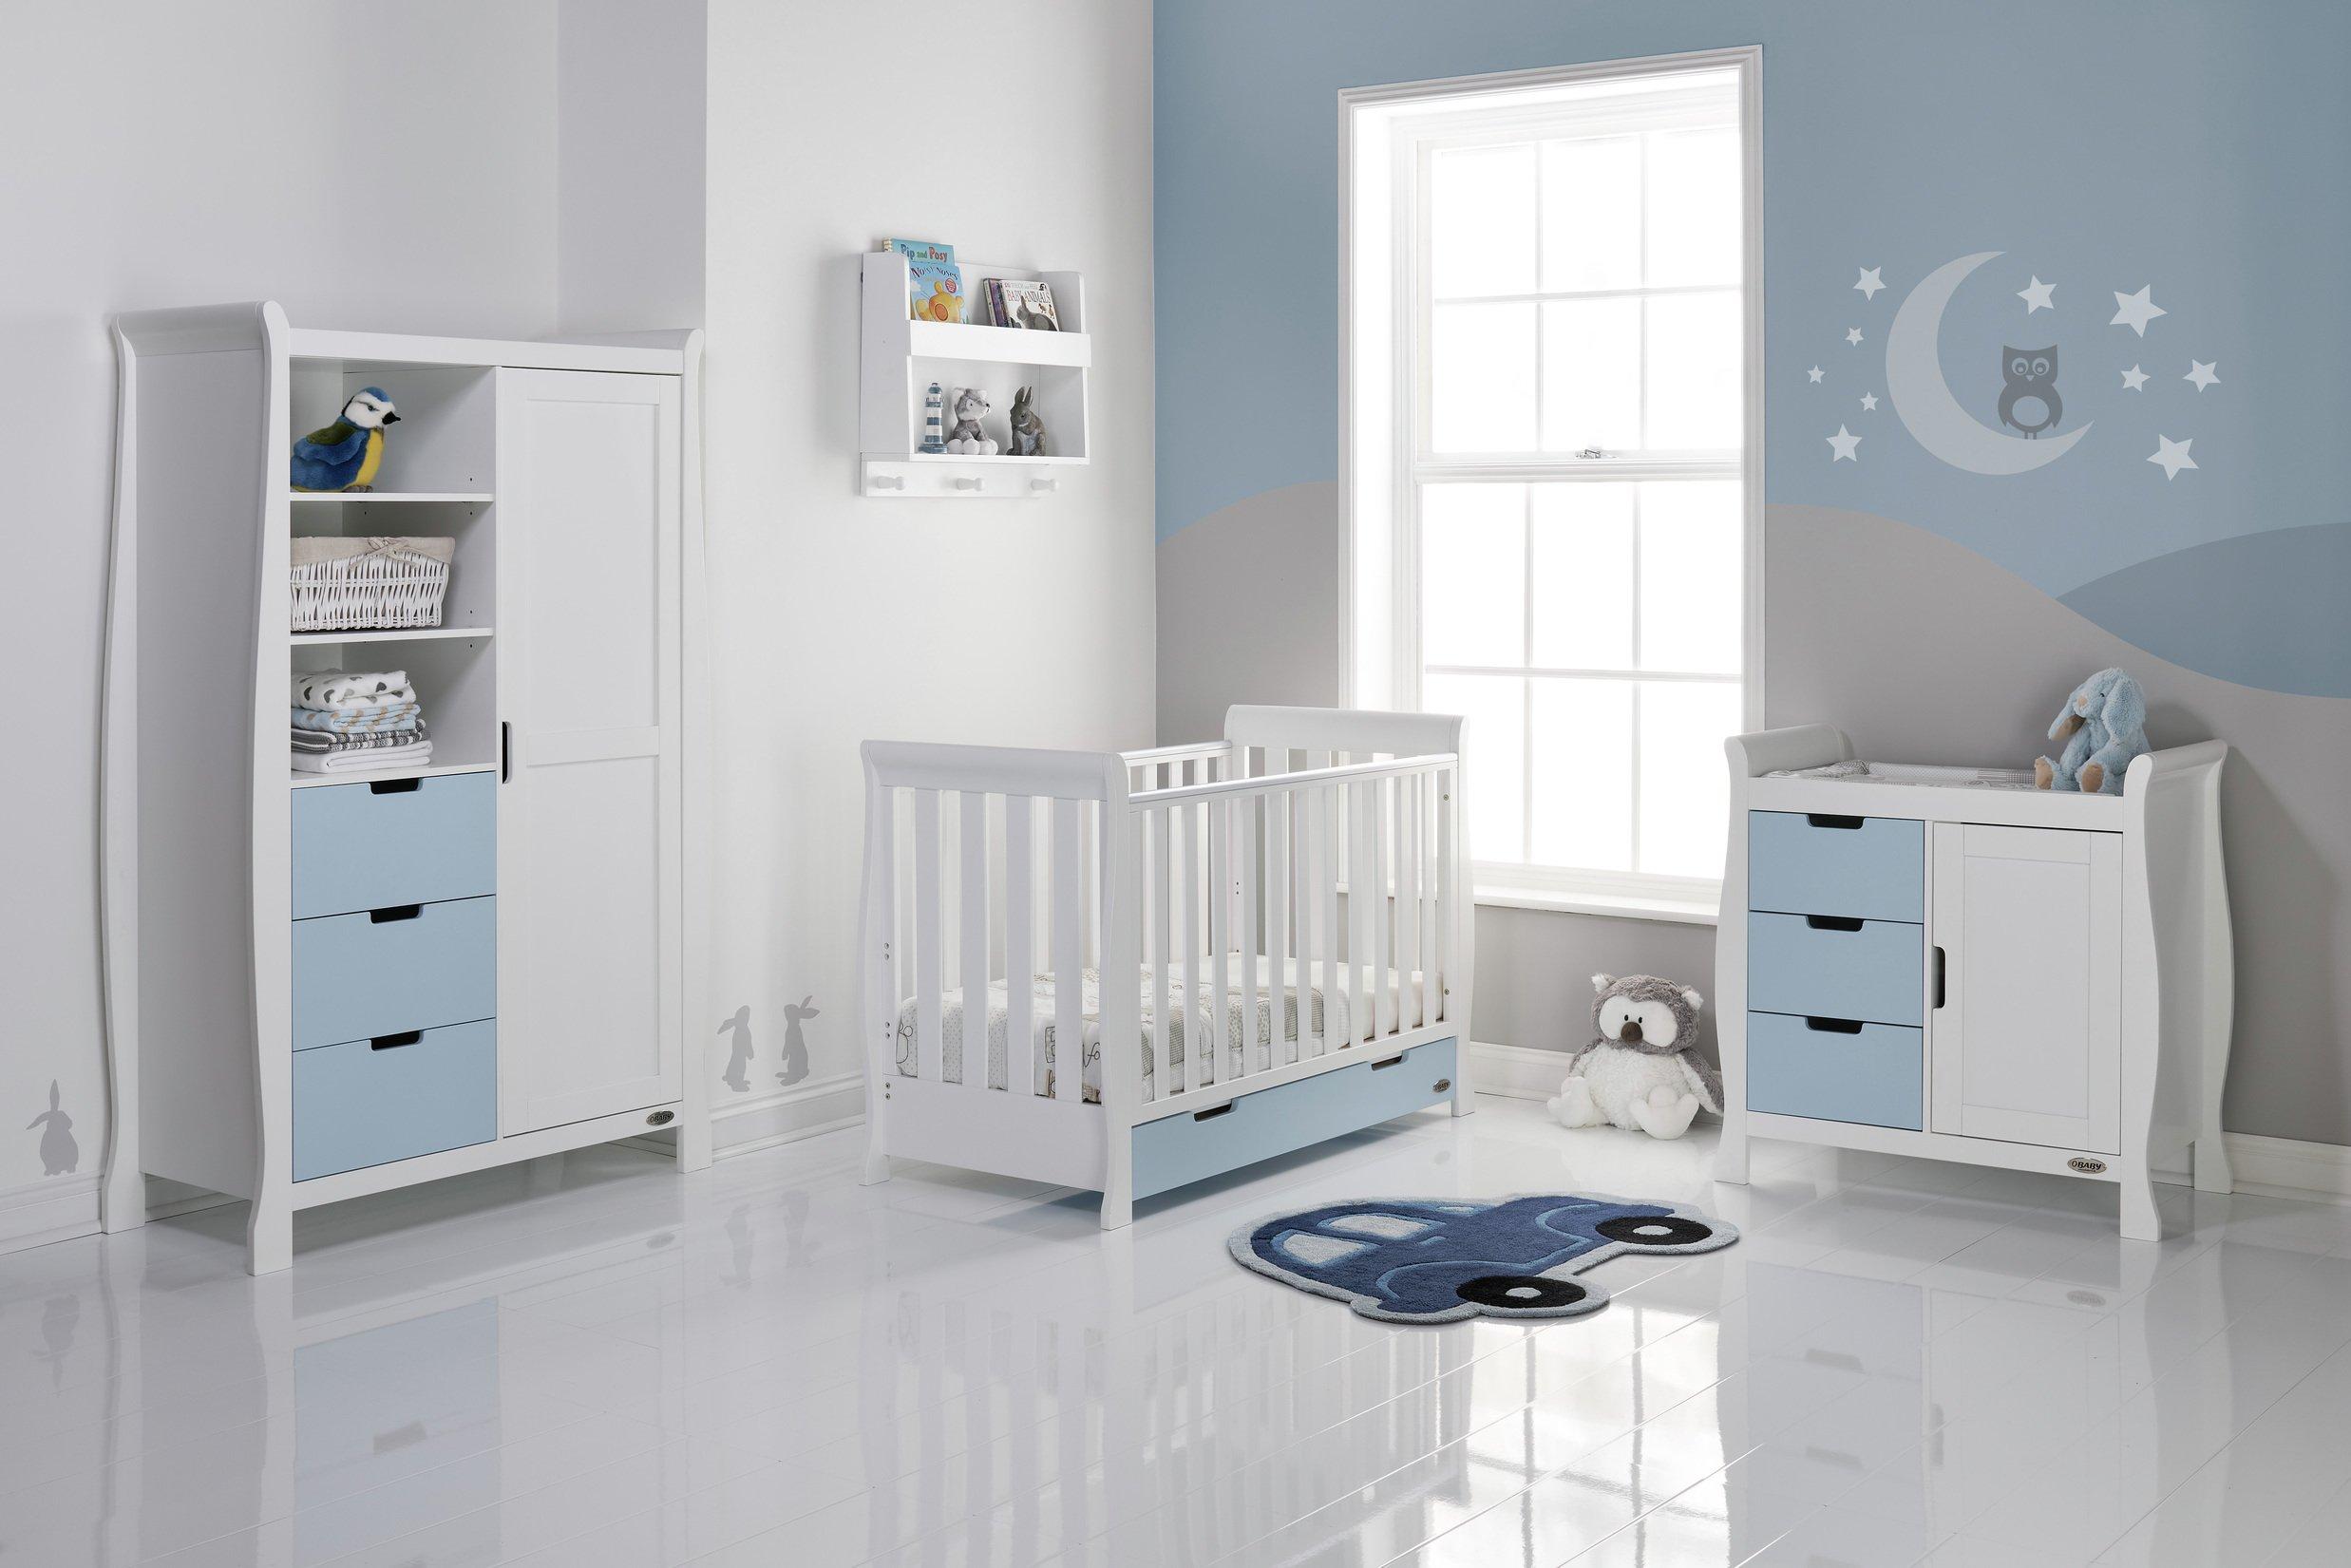 Obaby Obaby Stamford Mini Sleigh 3 Piece Room Set - White & Bonbon